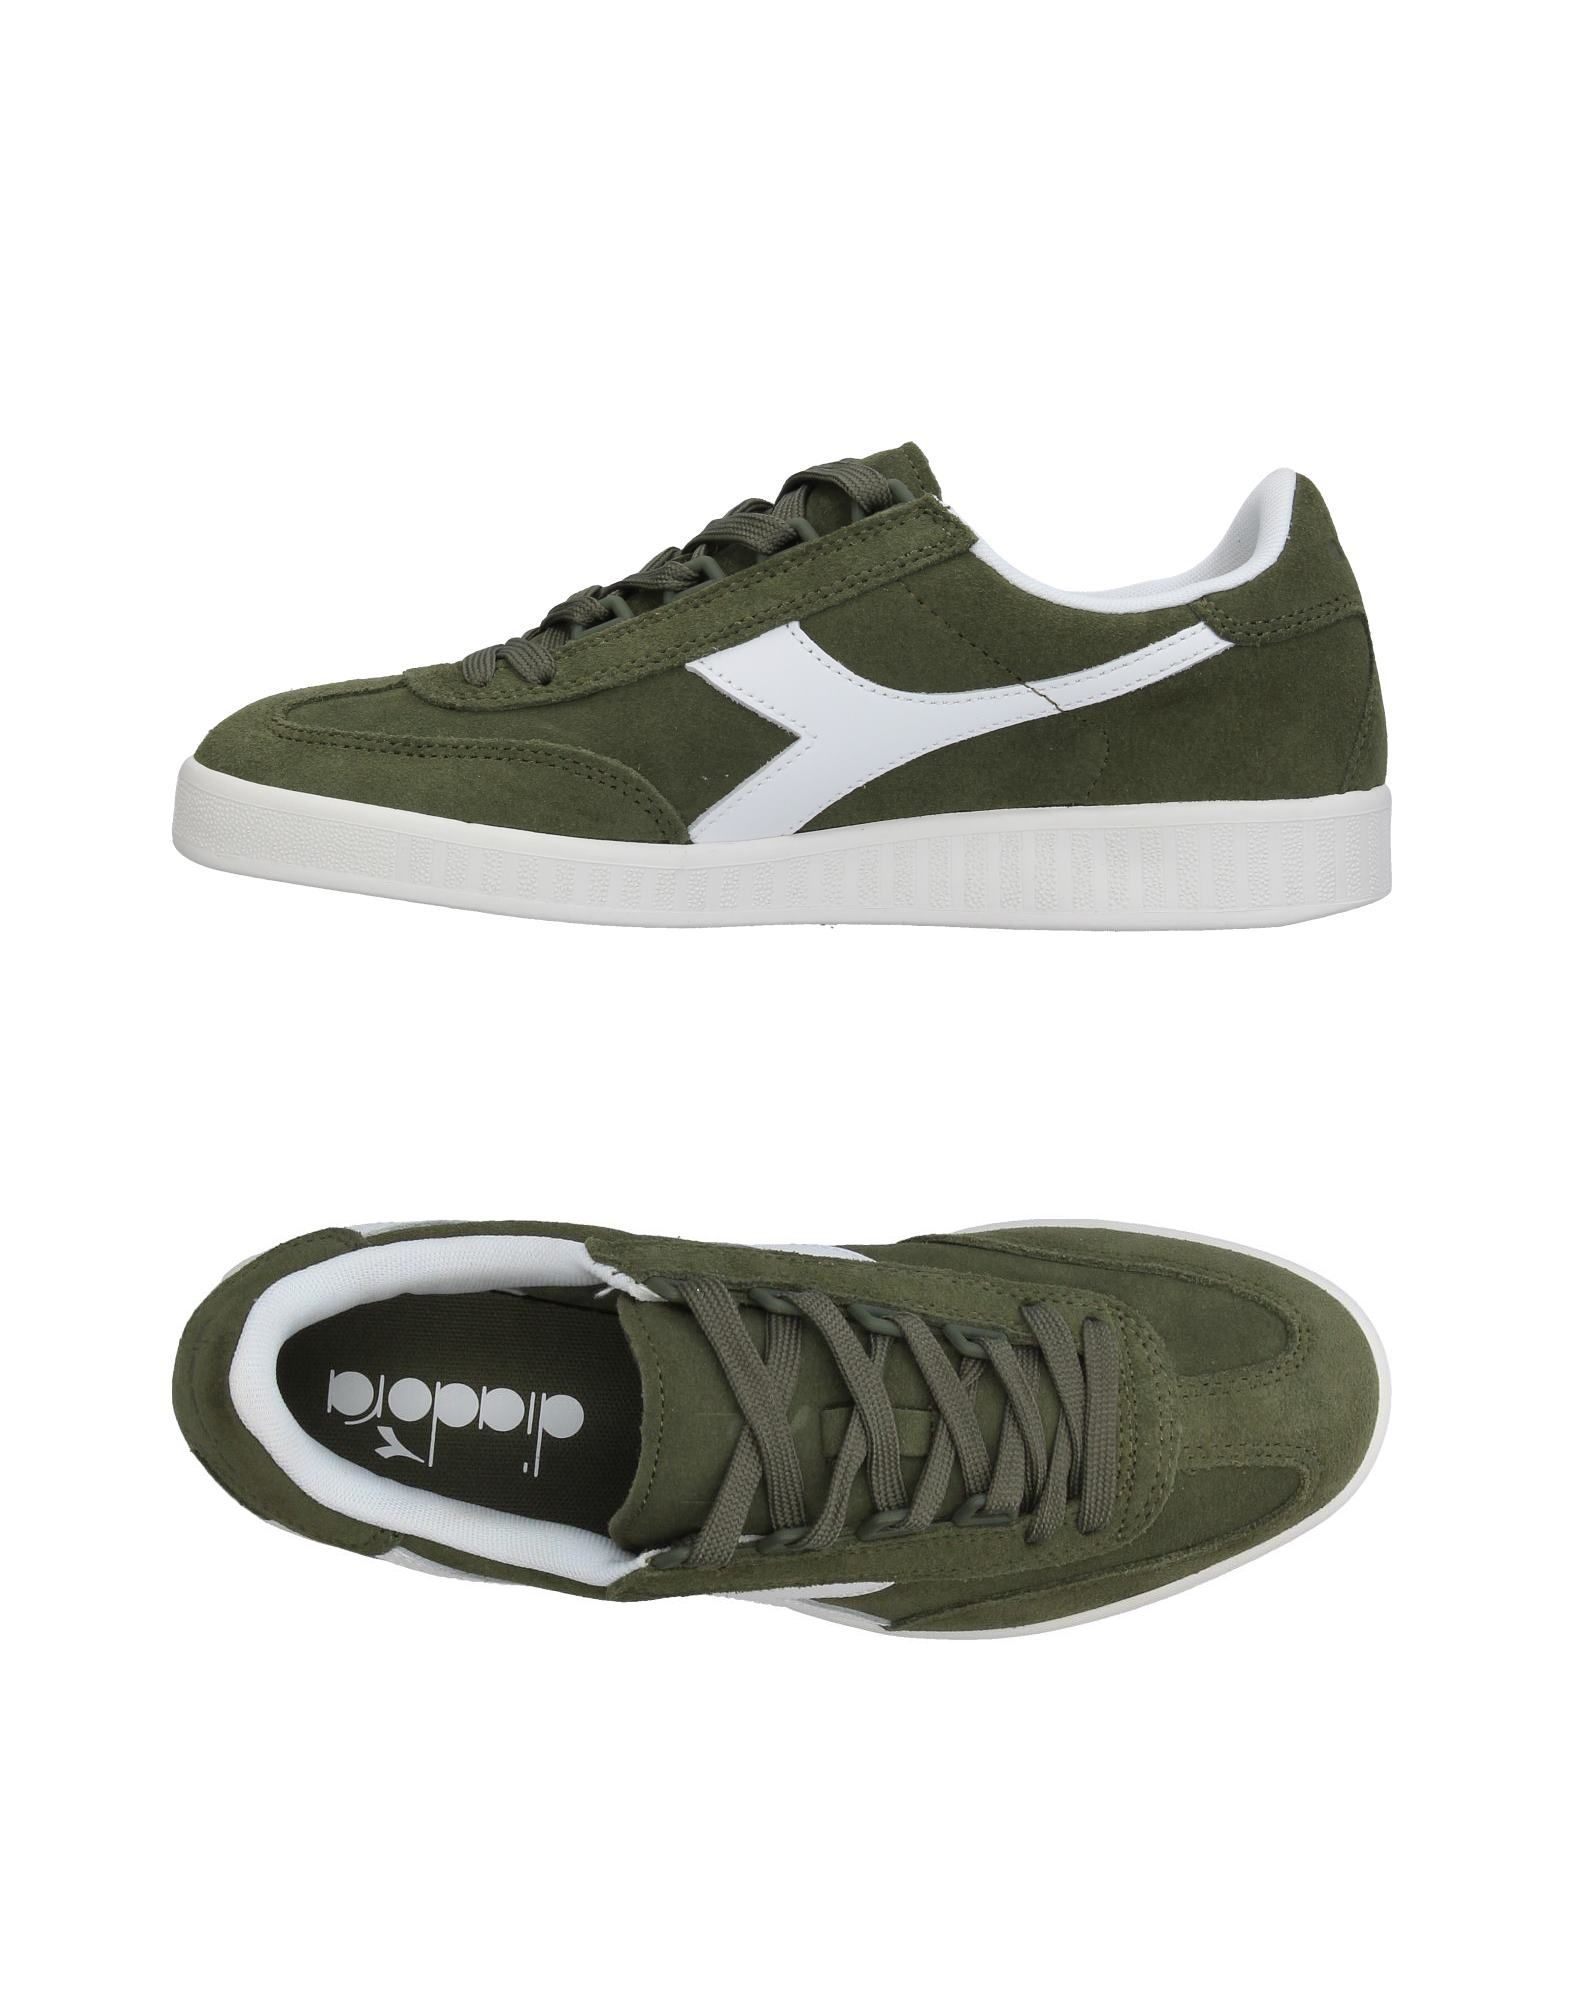 Diadora Sneakers Schuhe Herren  11379452FX Heiße Schuhe Sneakers c242f6